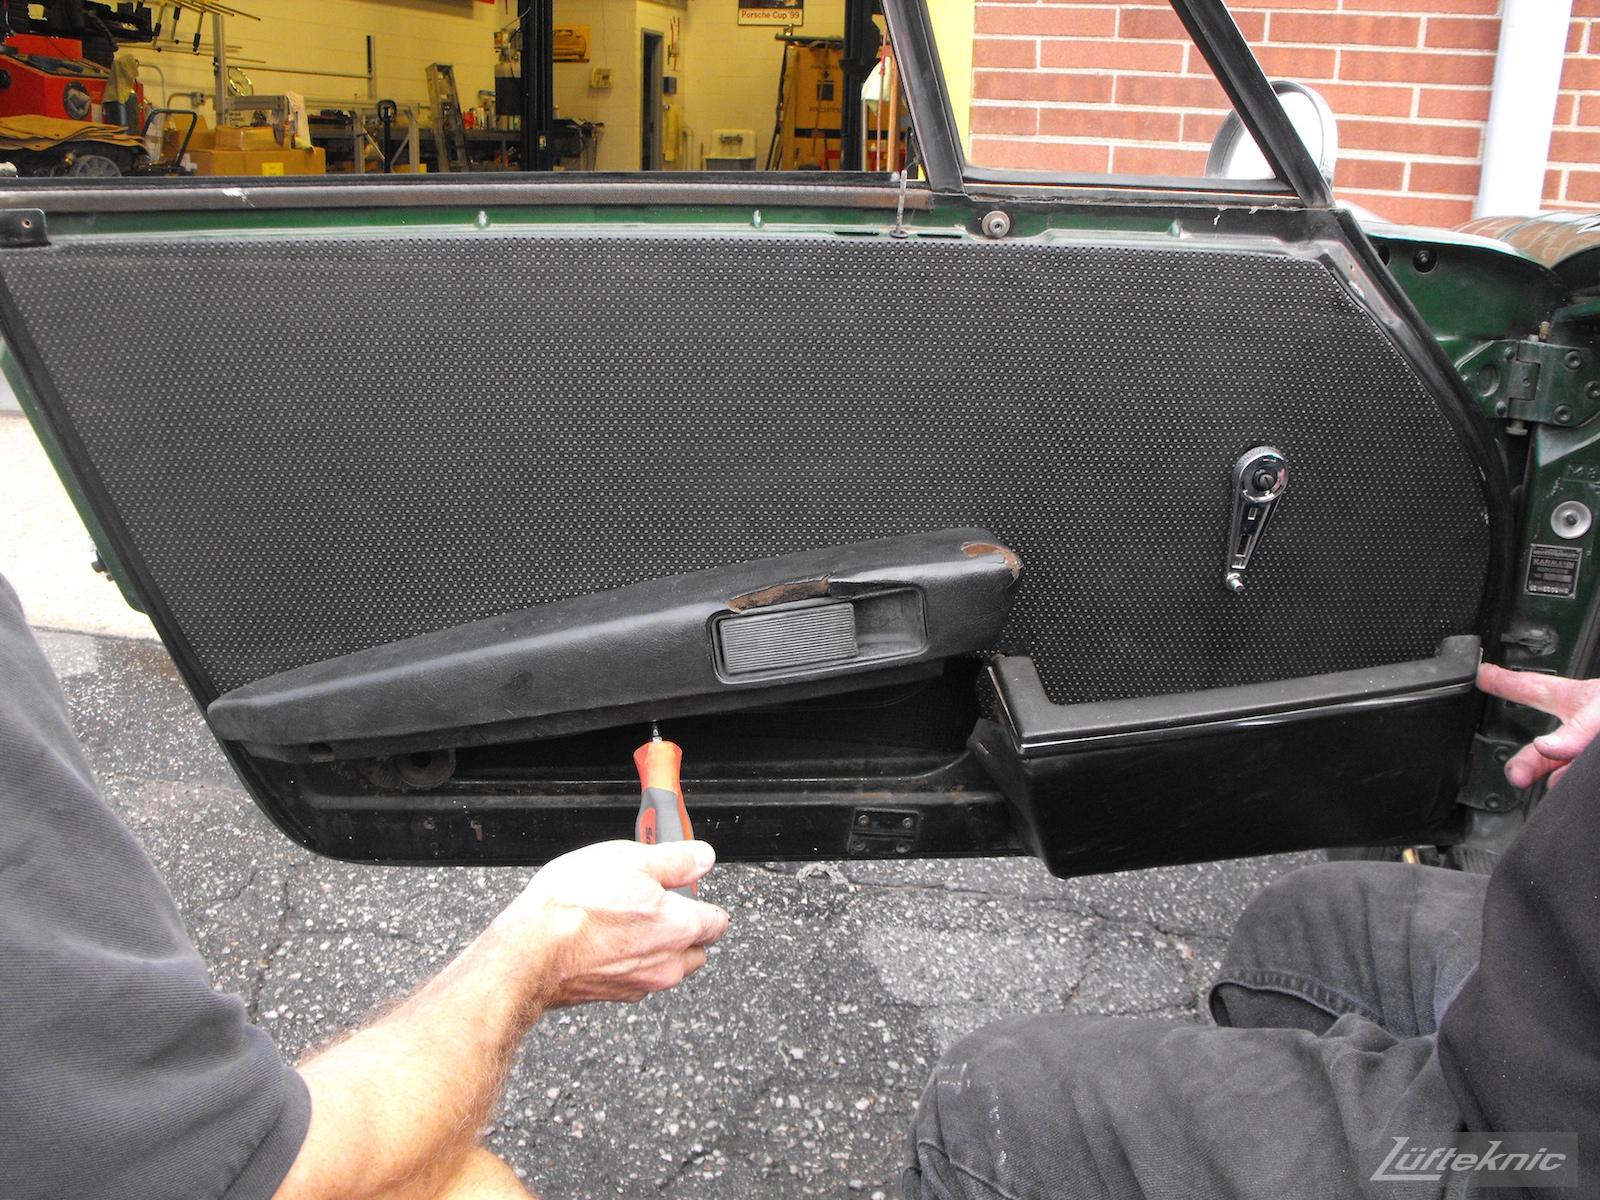 An Irish Green Porsche 912 undergoing restoration at Lufteknic. Removing the door panel.